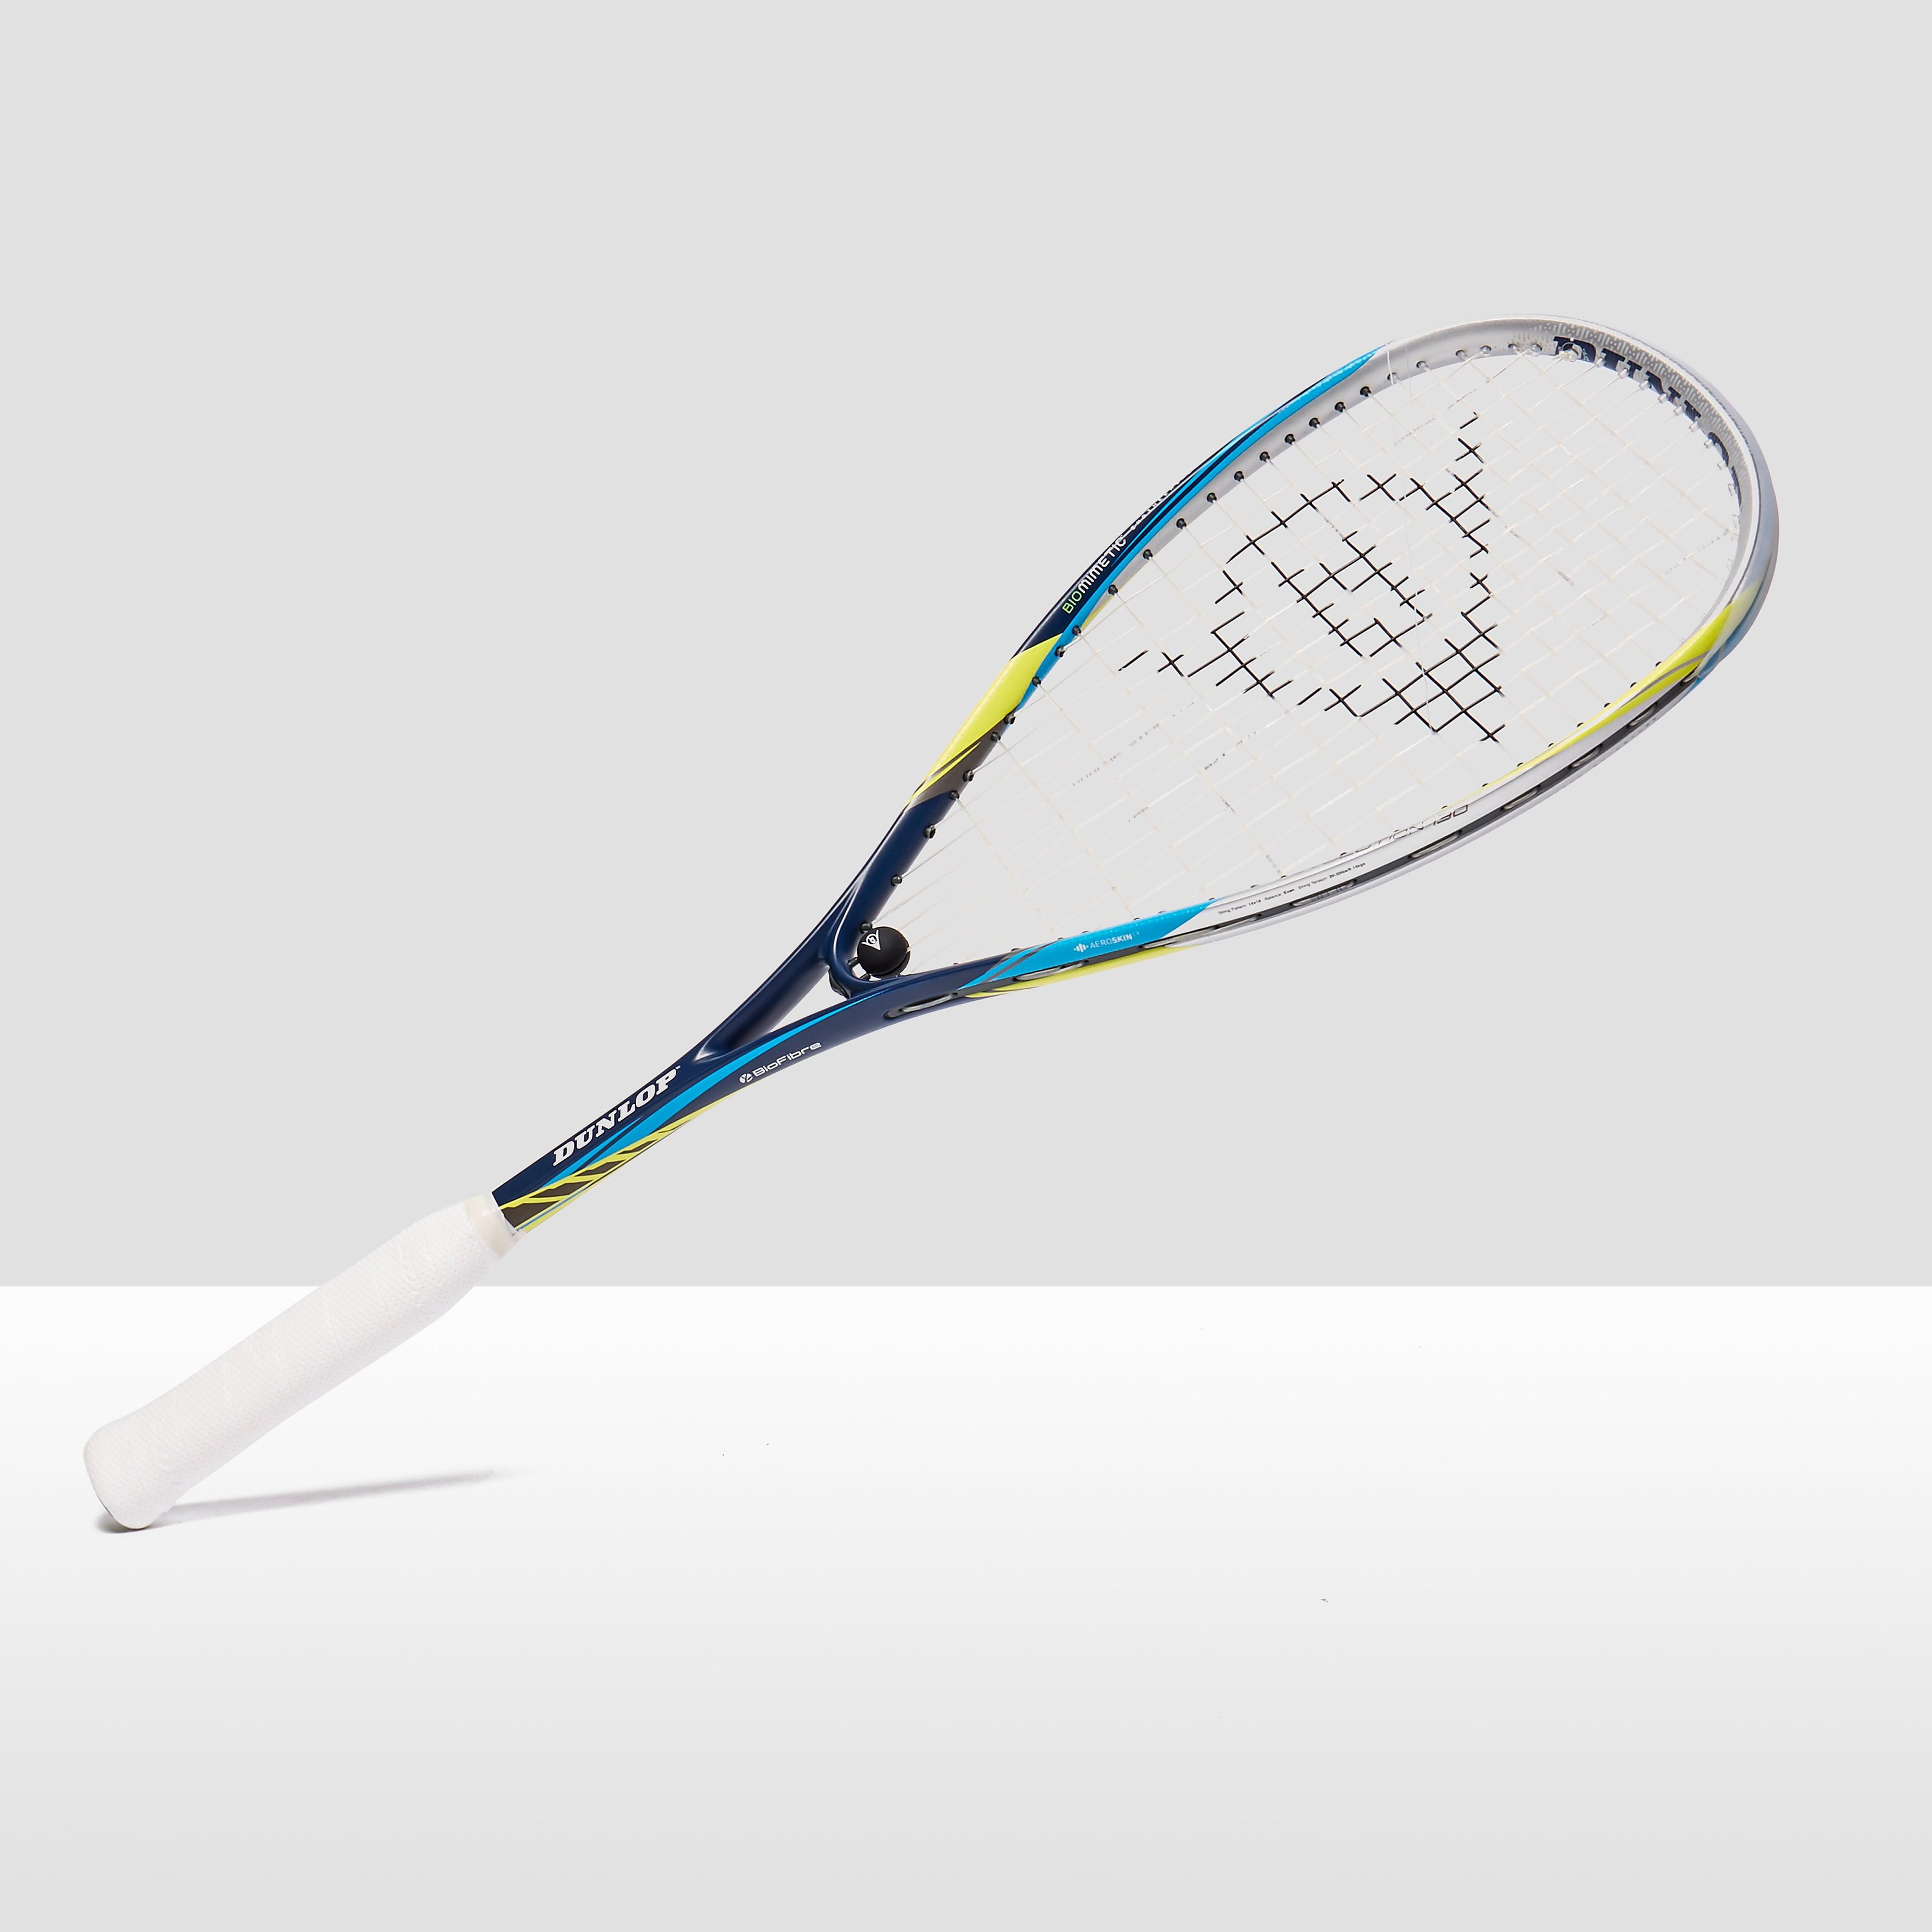 Dunlop Biomimetic Evolution 130 Squash Racket